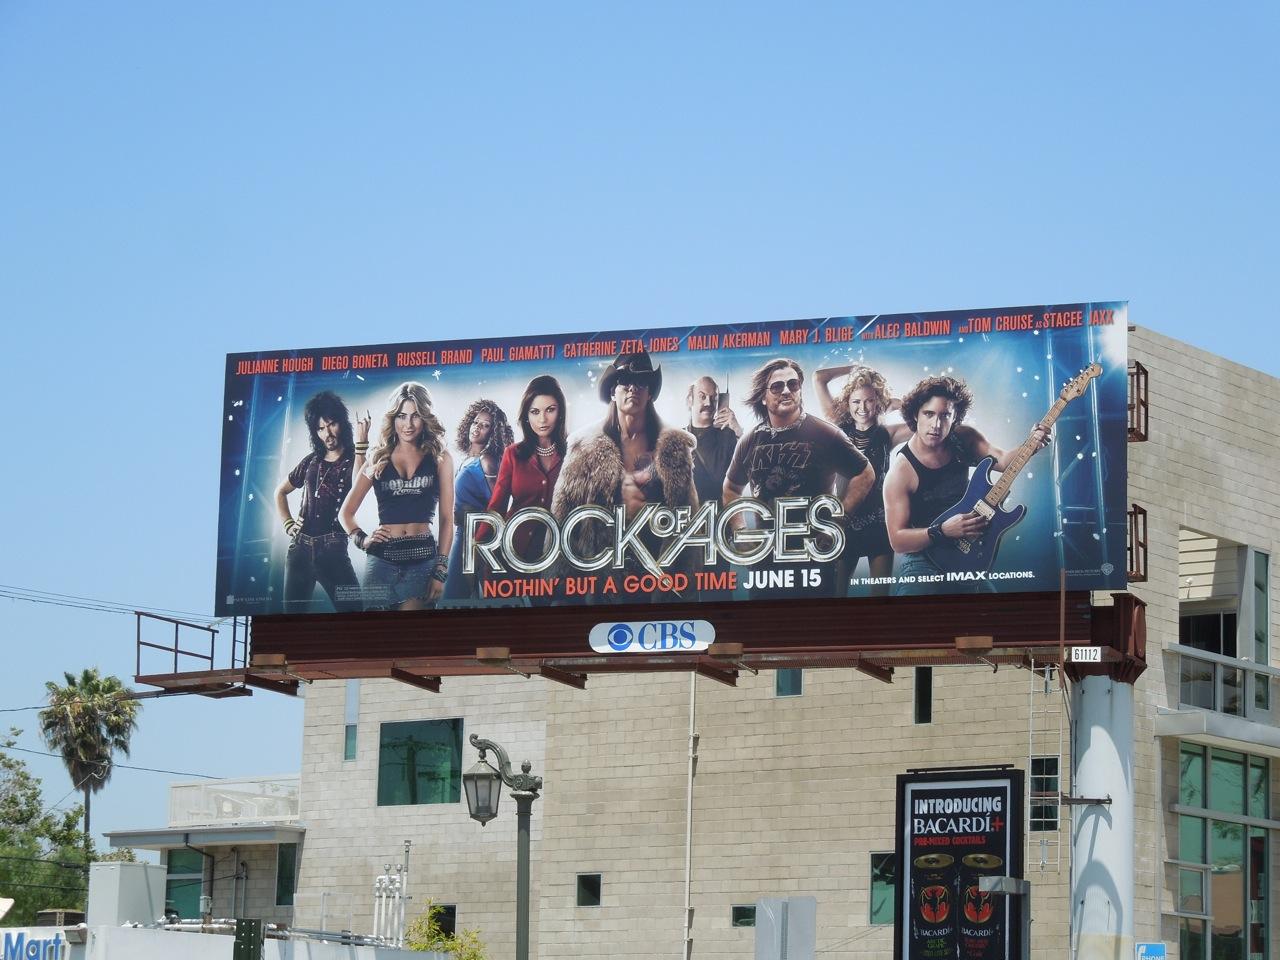 http://3.bp.blogspot.com/-7G68ADRpd5k/T8fH0rJ4IAI/AAAAAAAAr30/vy8yApLredI/s1600/RockofAges+film+billboard.jpg